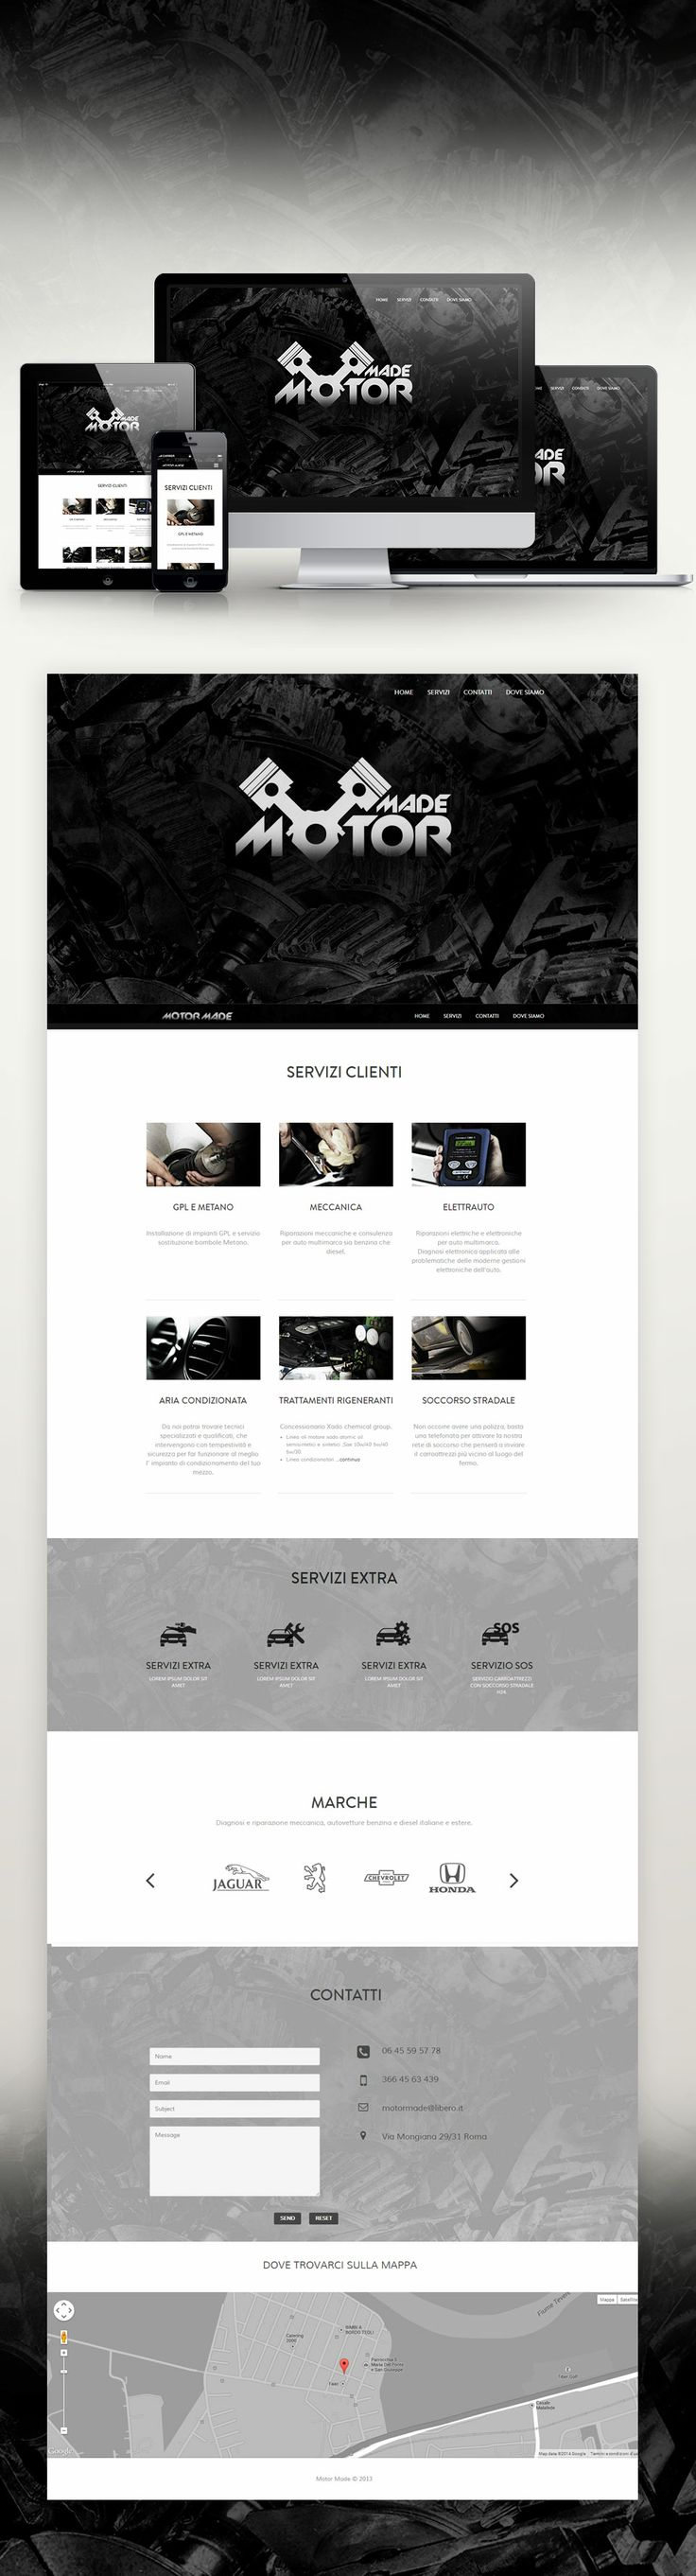 SIMONE BOI | GRAPHIC DESIGNER  sito Motor Made